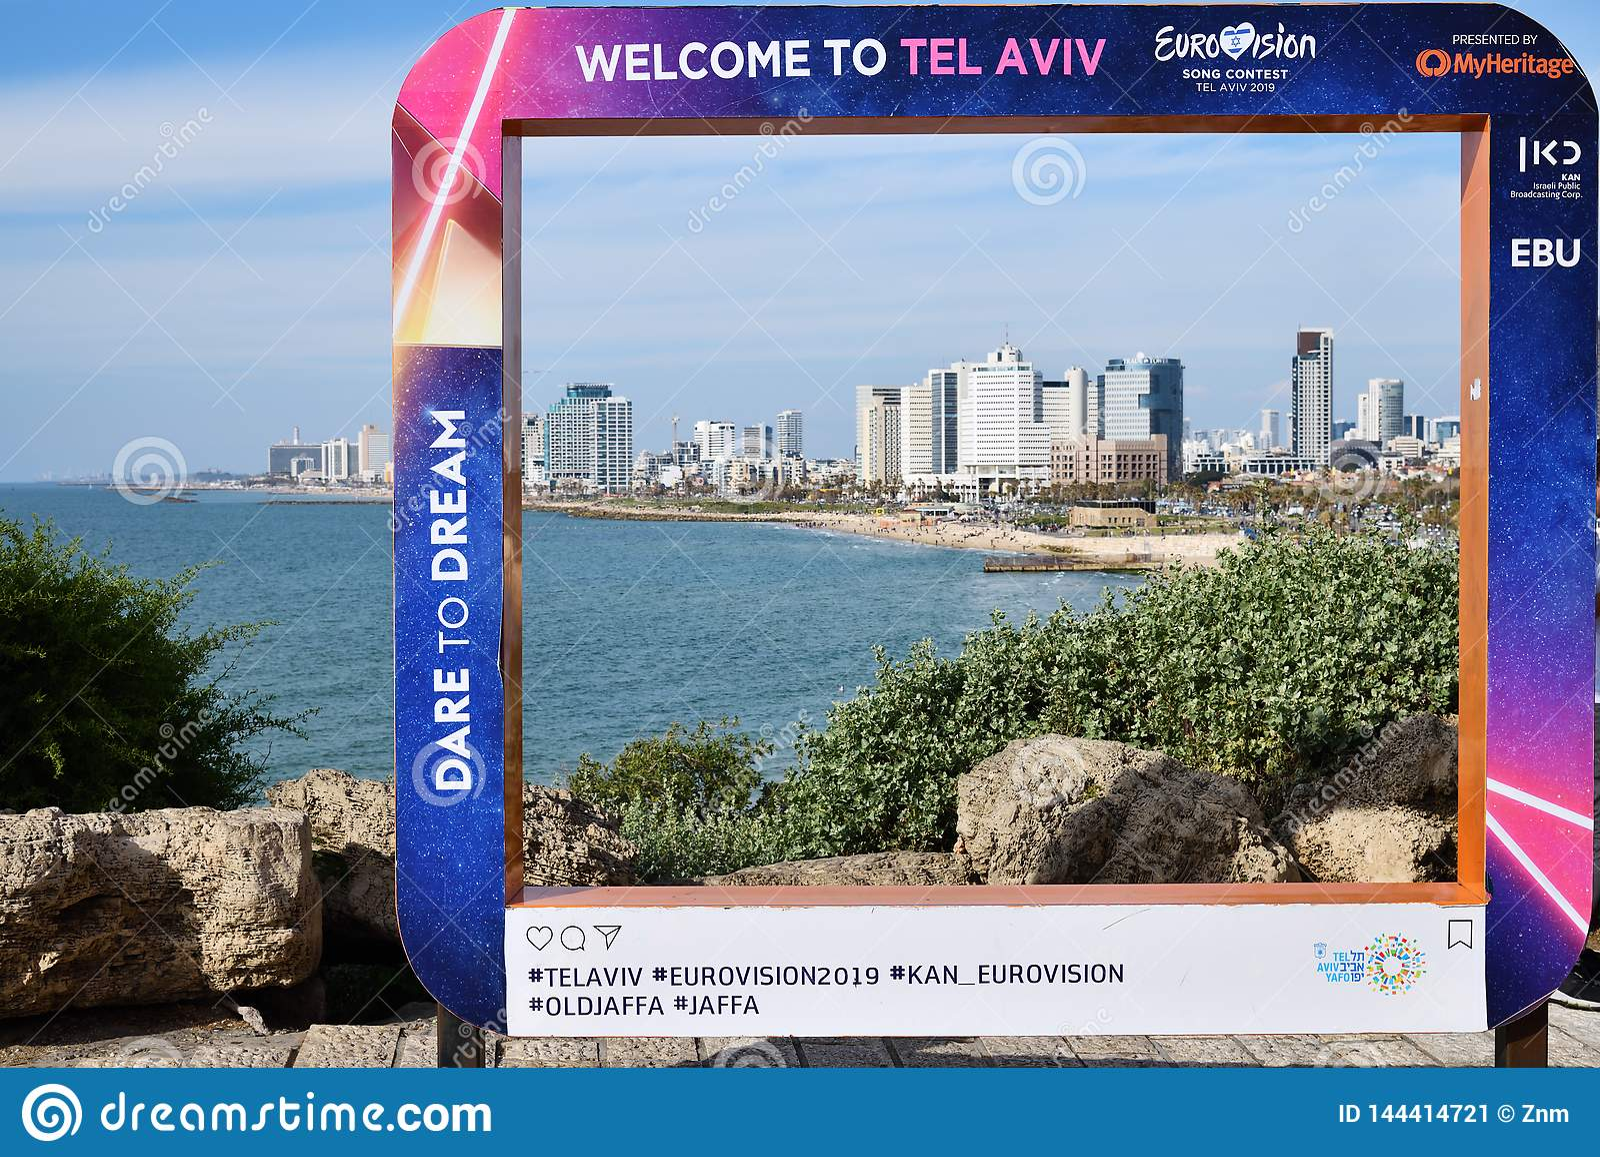 Eurovision Song Contest 2019 Tel Aviv poster. Israel